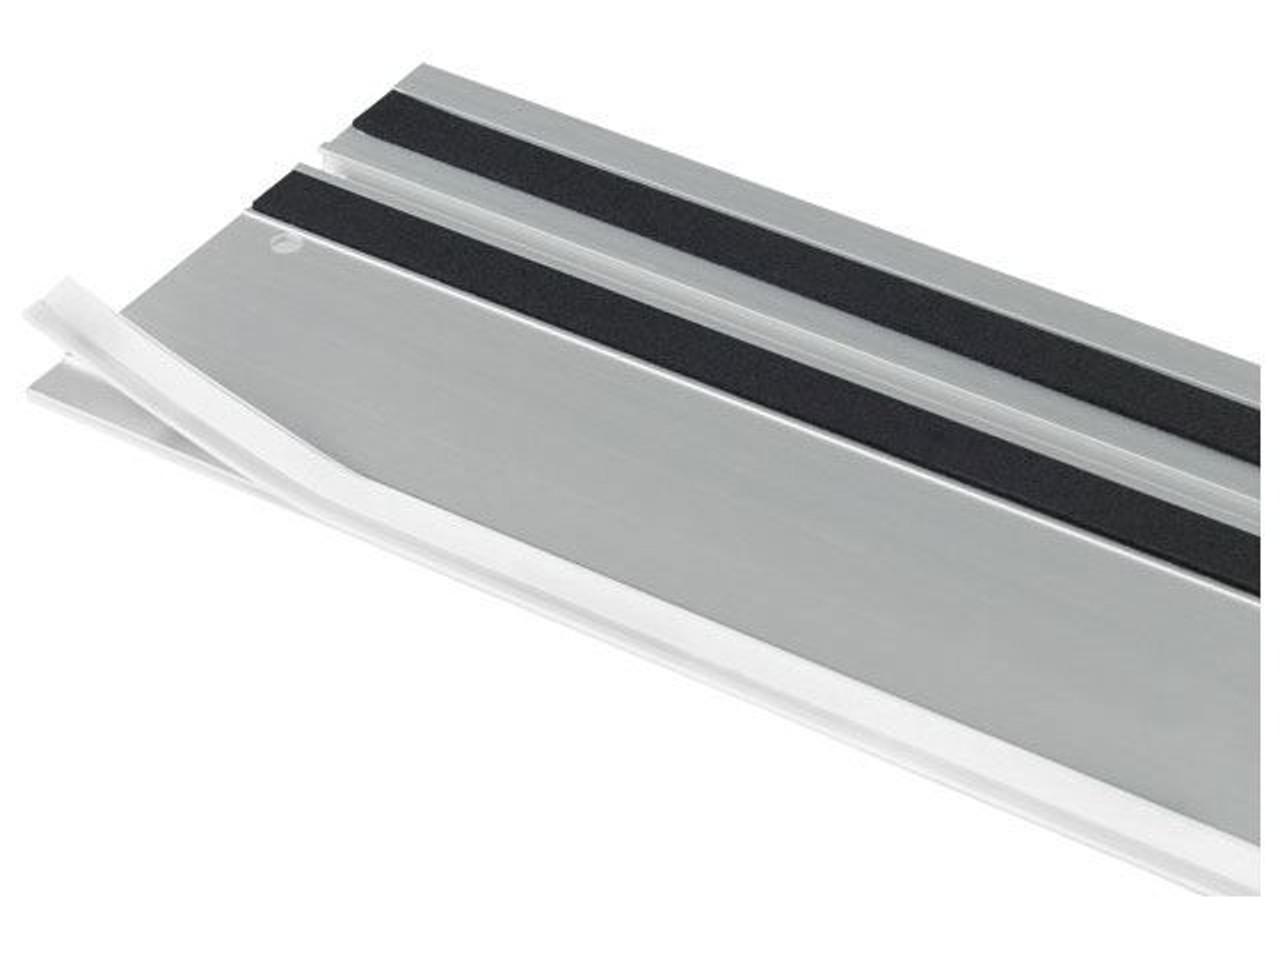 FESTOOL Guide Rail Replacement Splinter Guard Clear 5.0m 5000mm 495209